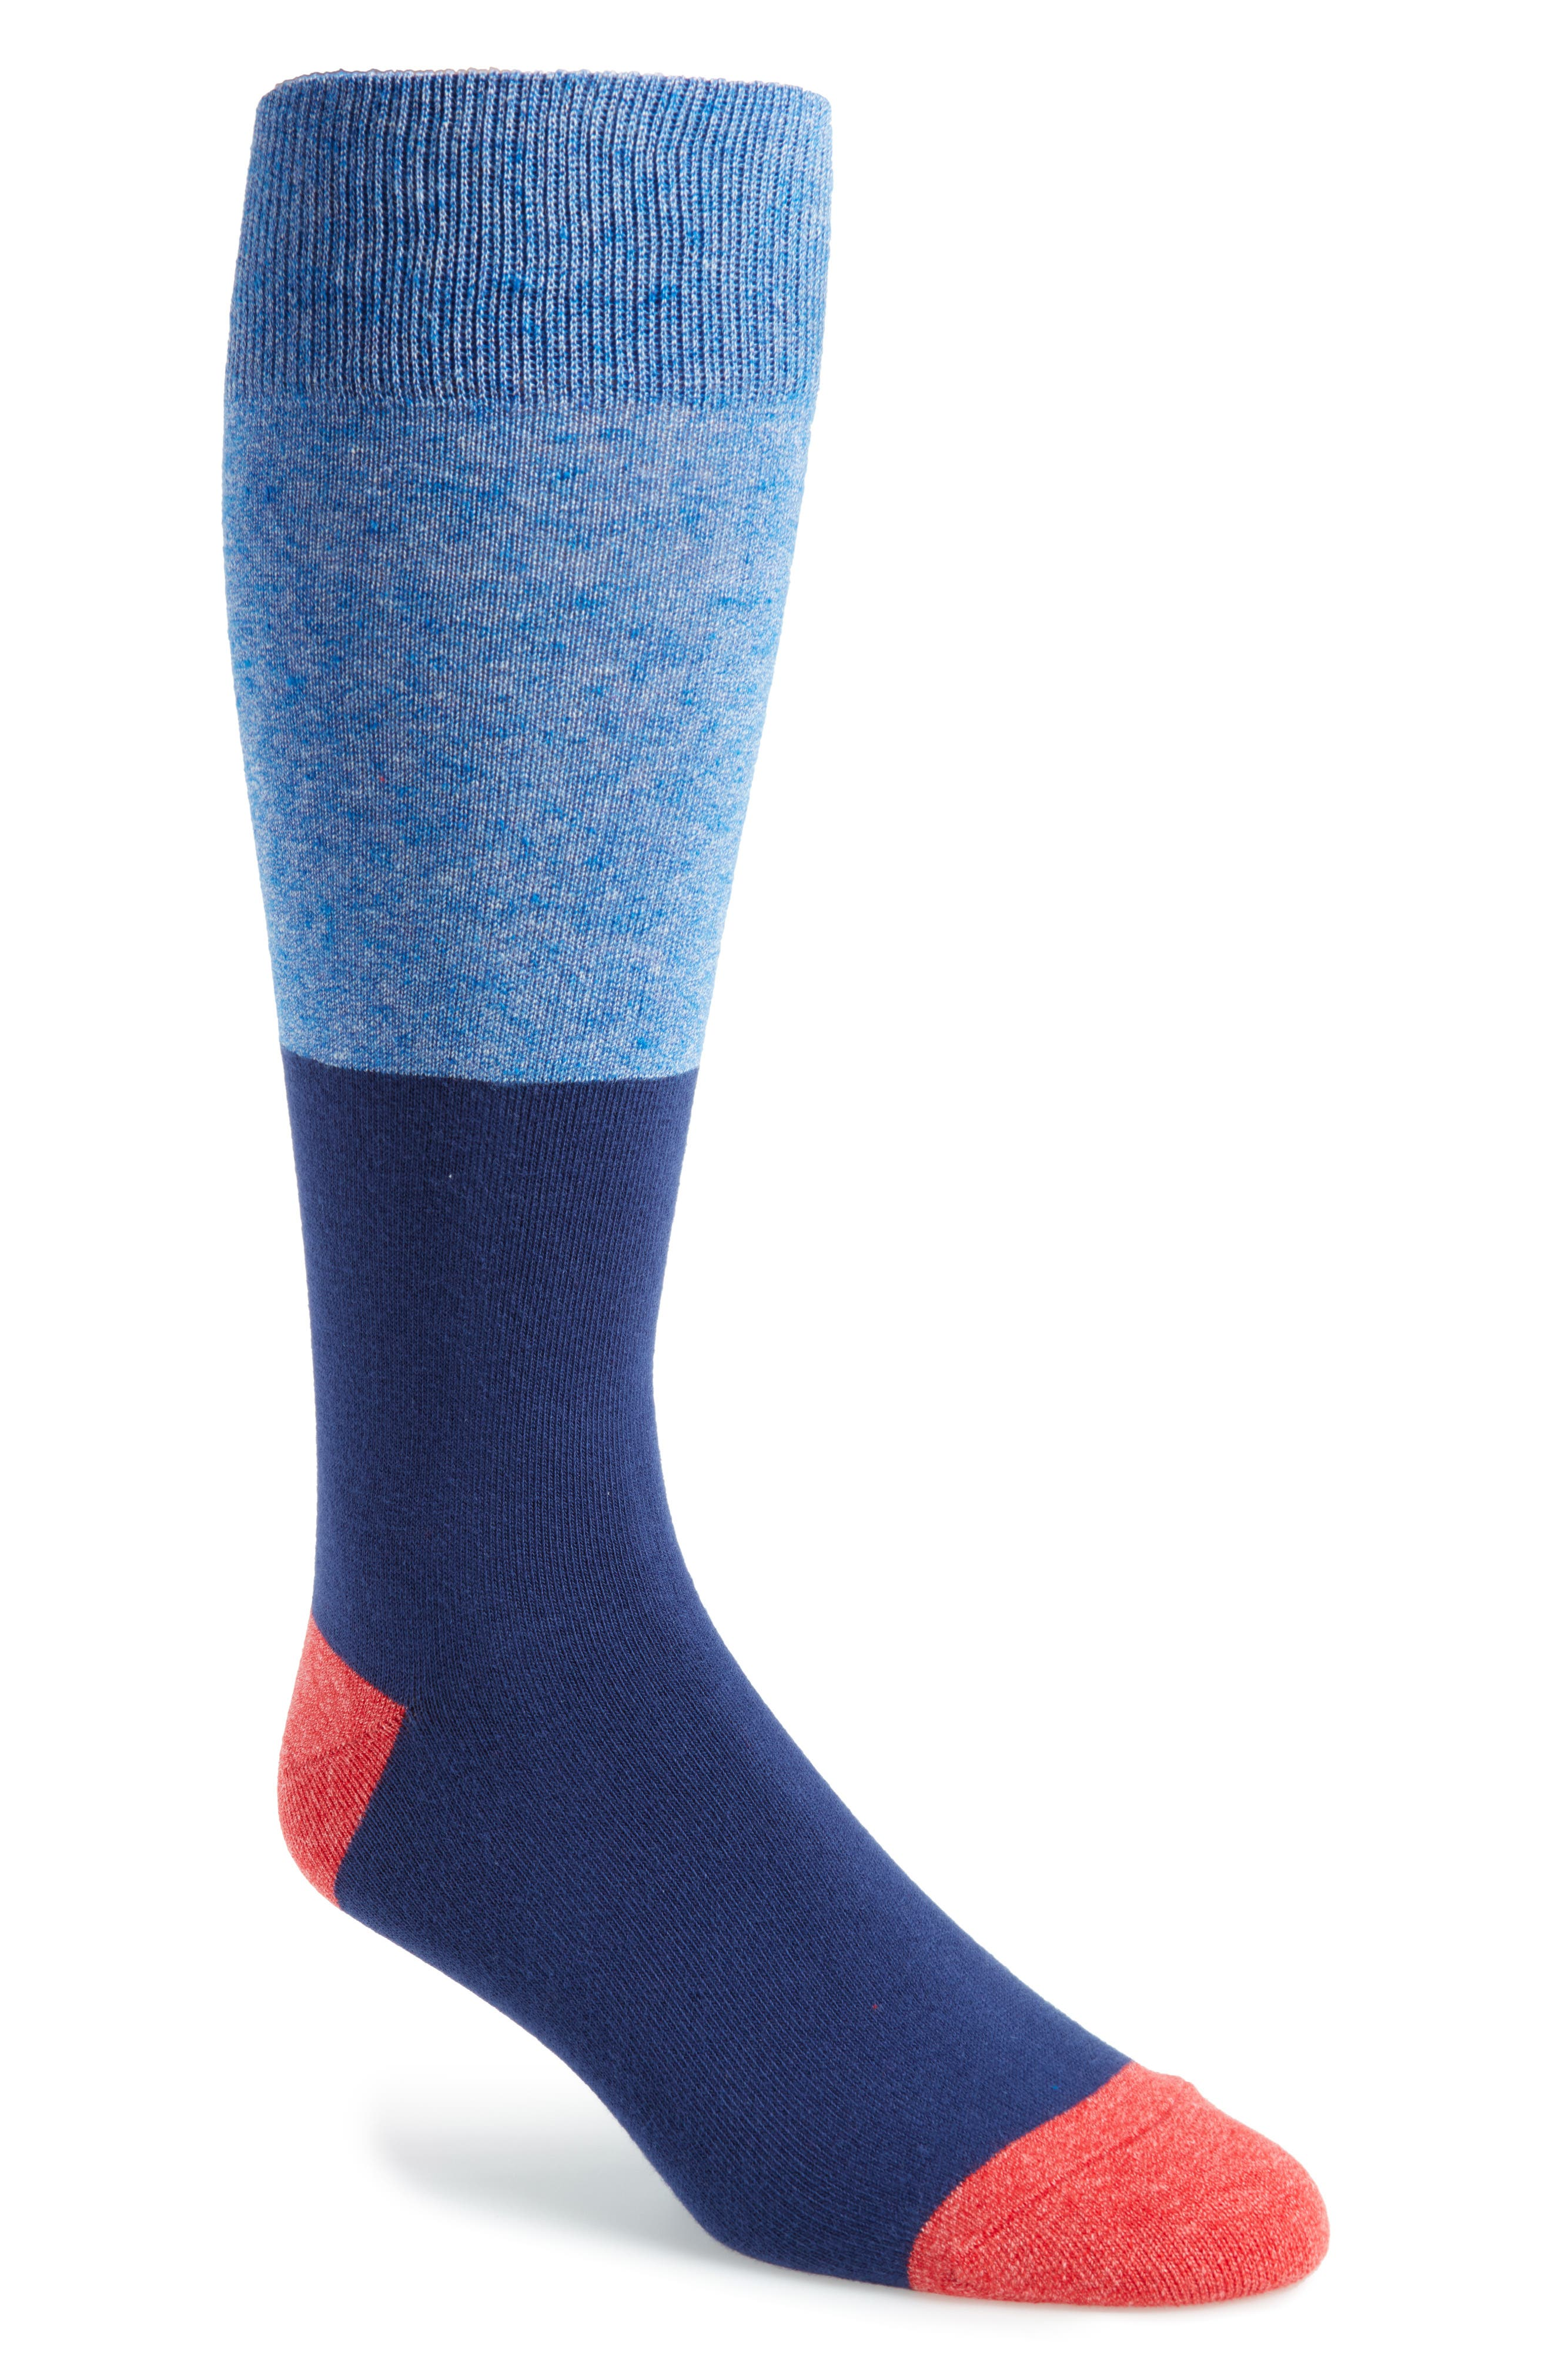 Colorblock Socks,                             Main thumbnail 1, color,                             Navy/ Red